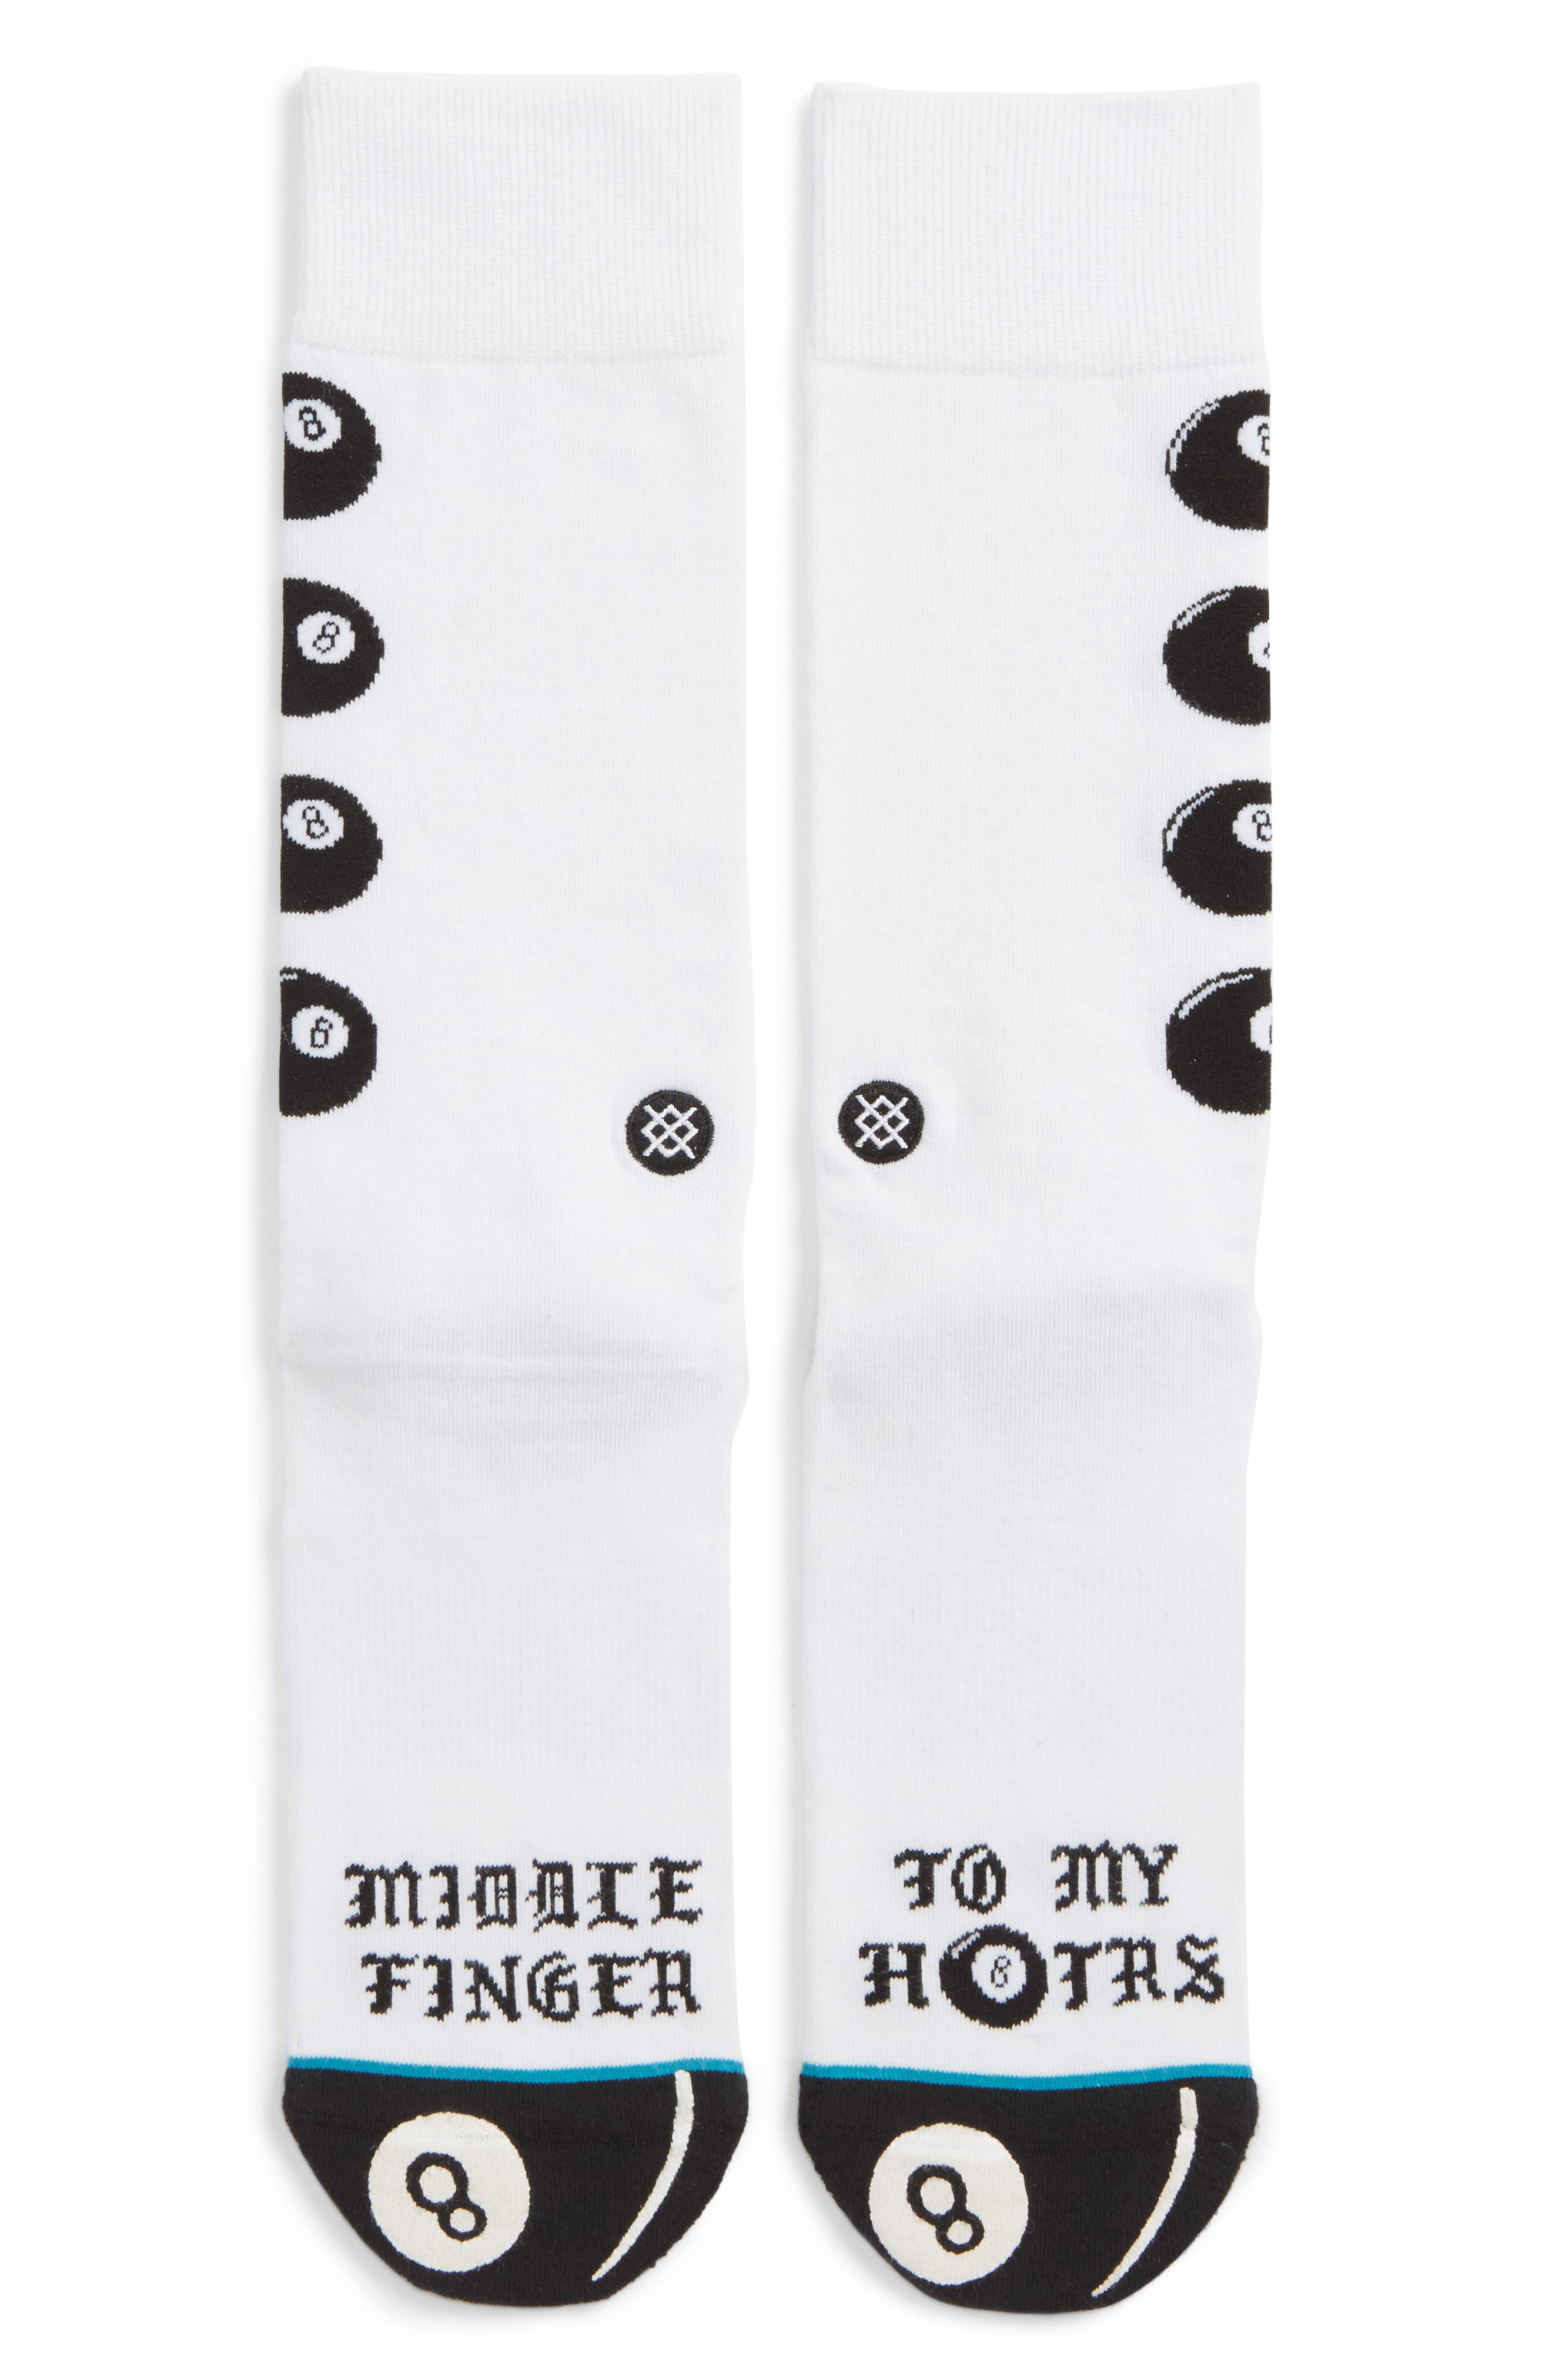 H8ters Socks,                         Main,                         color, White